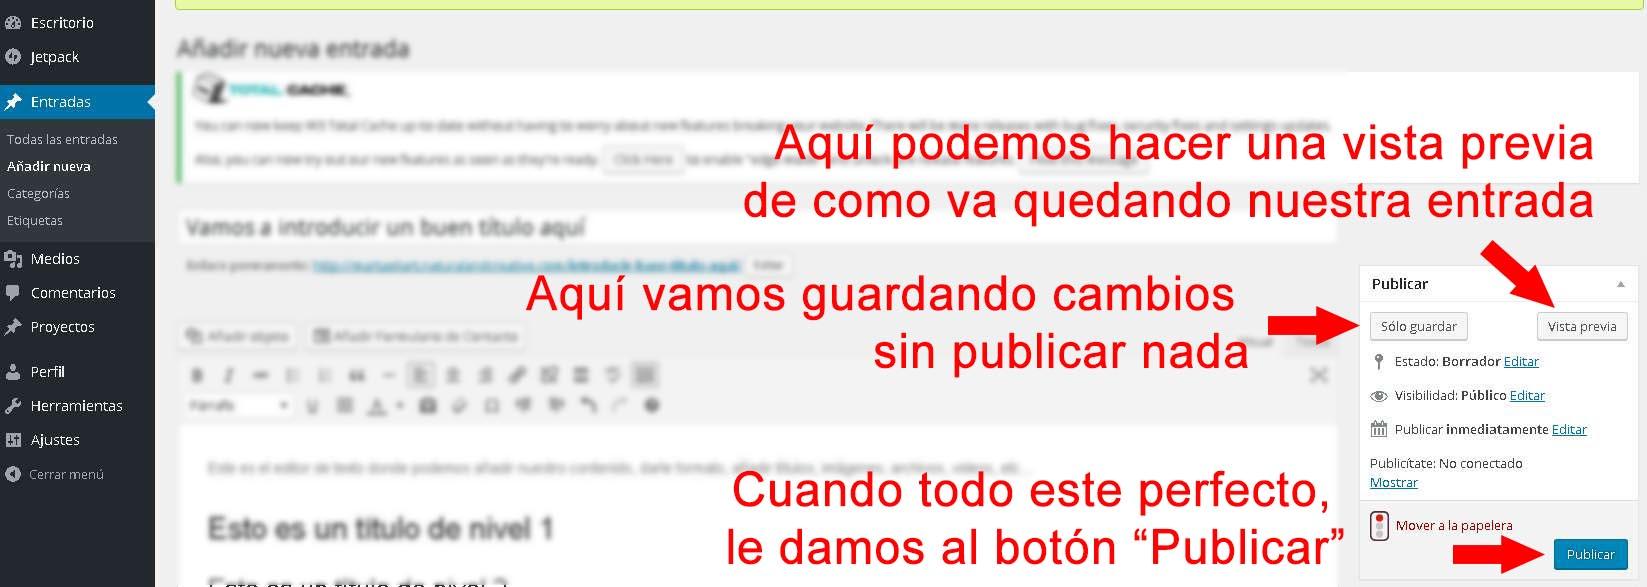 Posicionamiento SEO, Posicionamiento, SEO, editar blog wordpresss, editar entrada, editar categorias, wordpress, editar etiquetas, editar post, insertar imagen